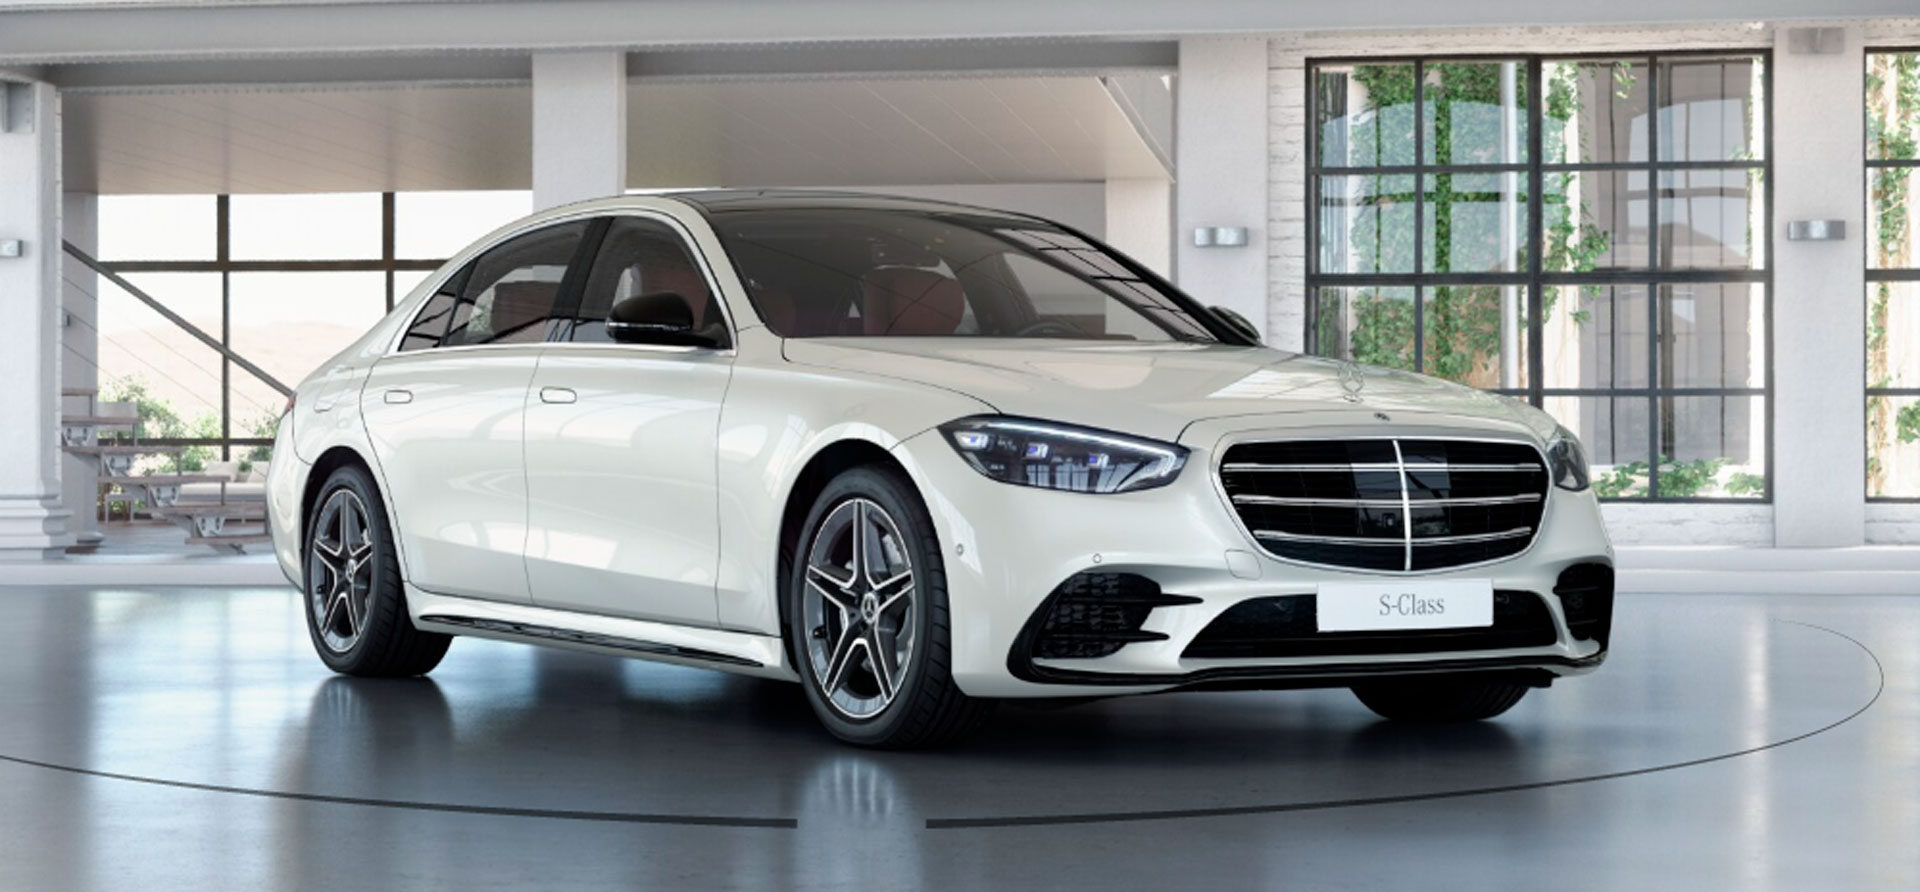 Mercedes-Benz S-Class Limousine 0152601217